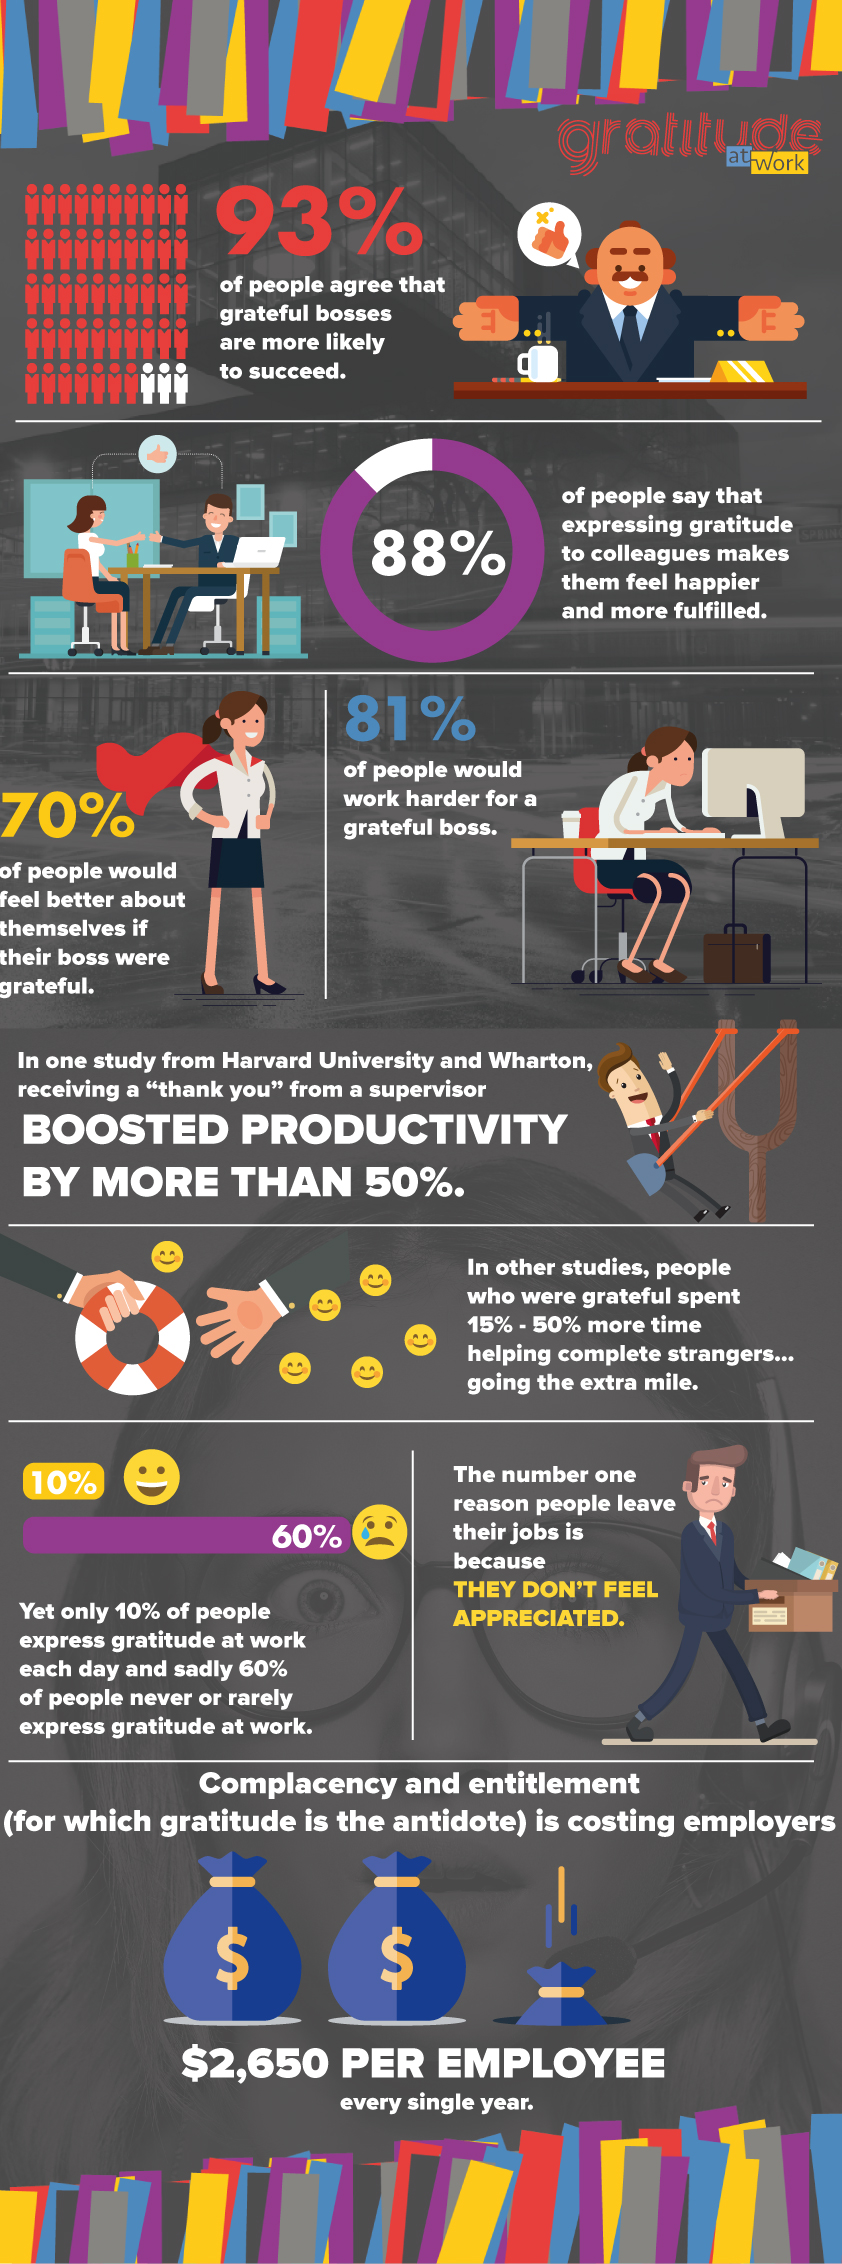 GaW gratitude infographic.jpg